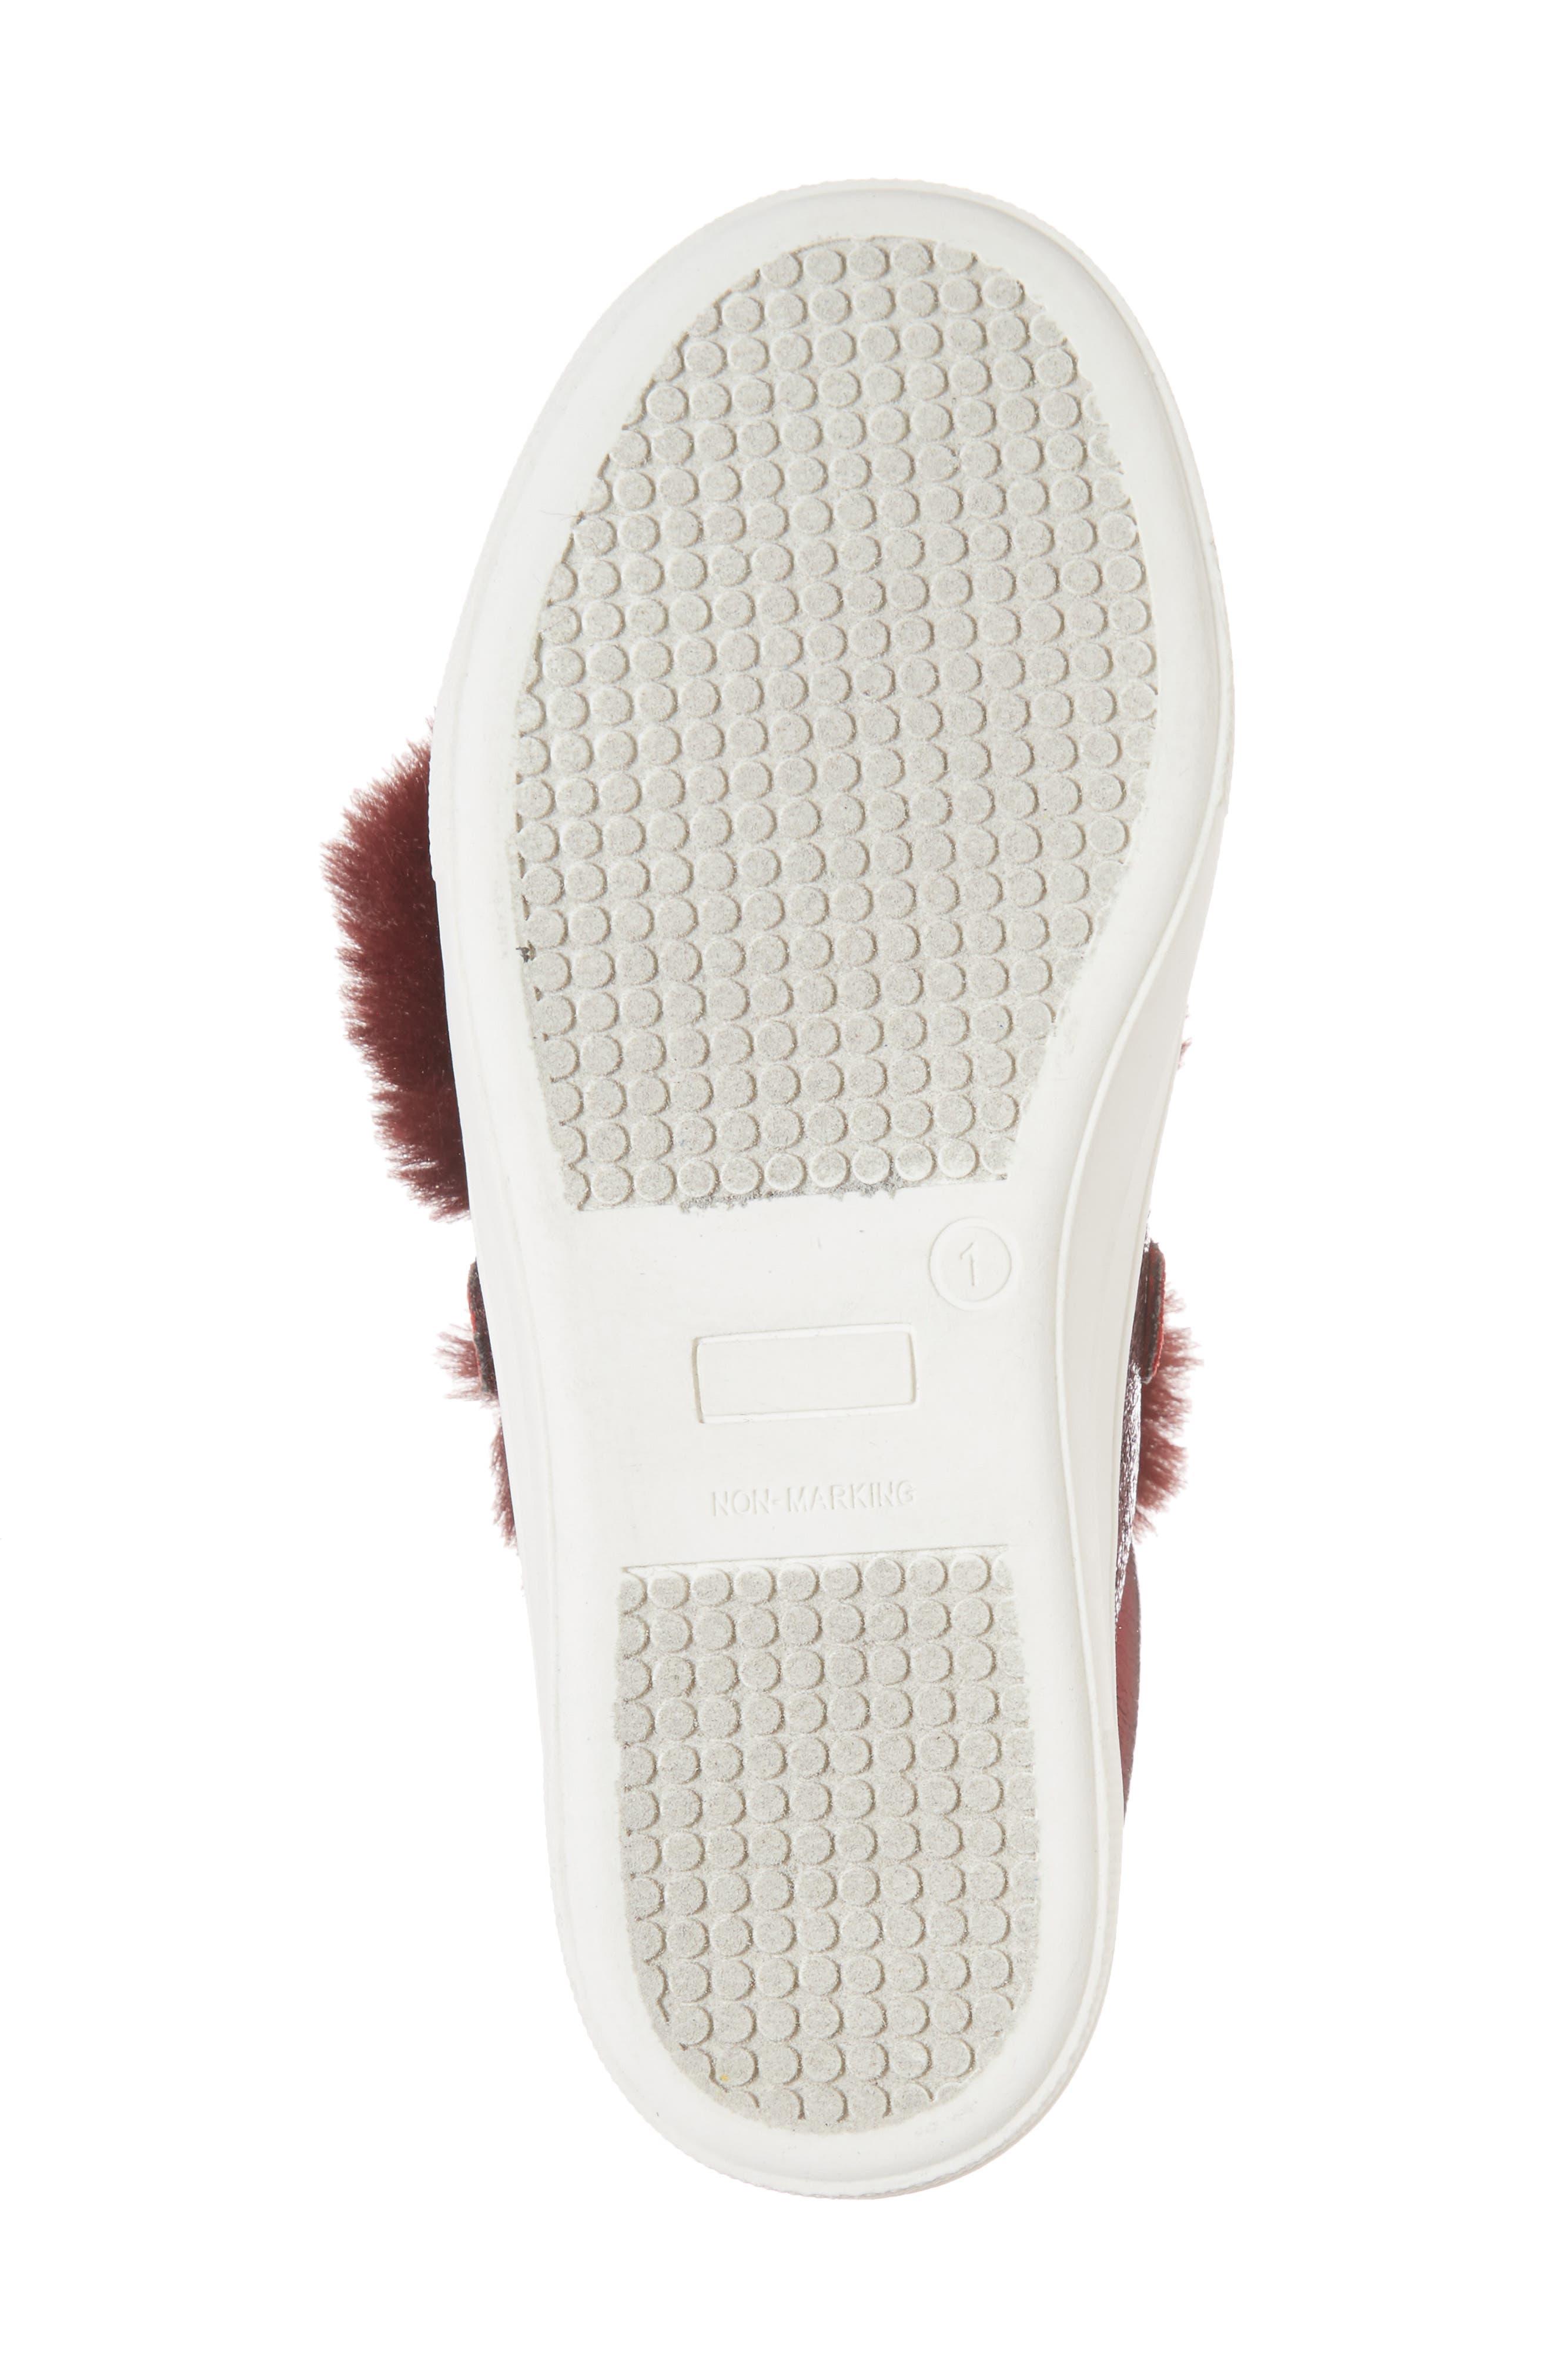 Zandra Faux Fur Metallic Sneaker,                             Alternate thumbnail 6, color,                             Burgundy Faux Leather